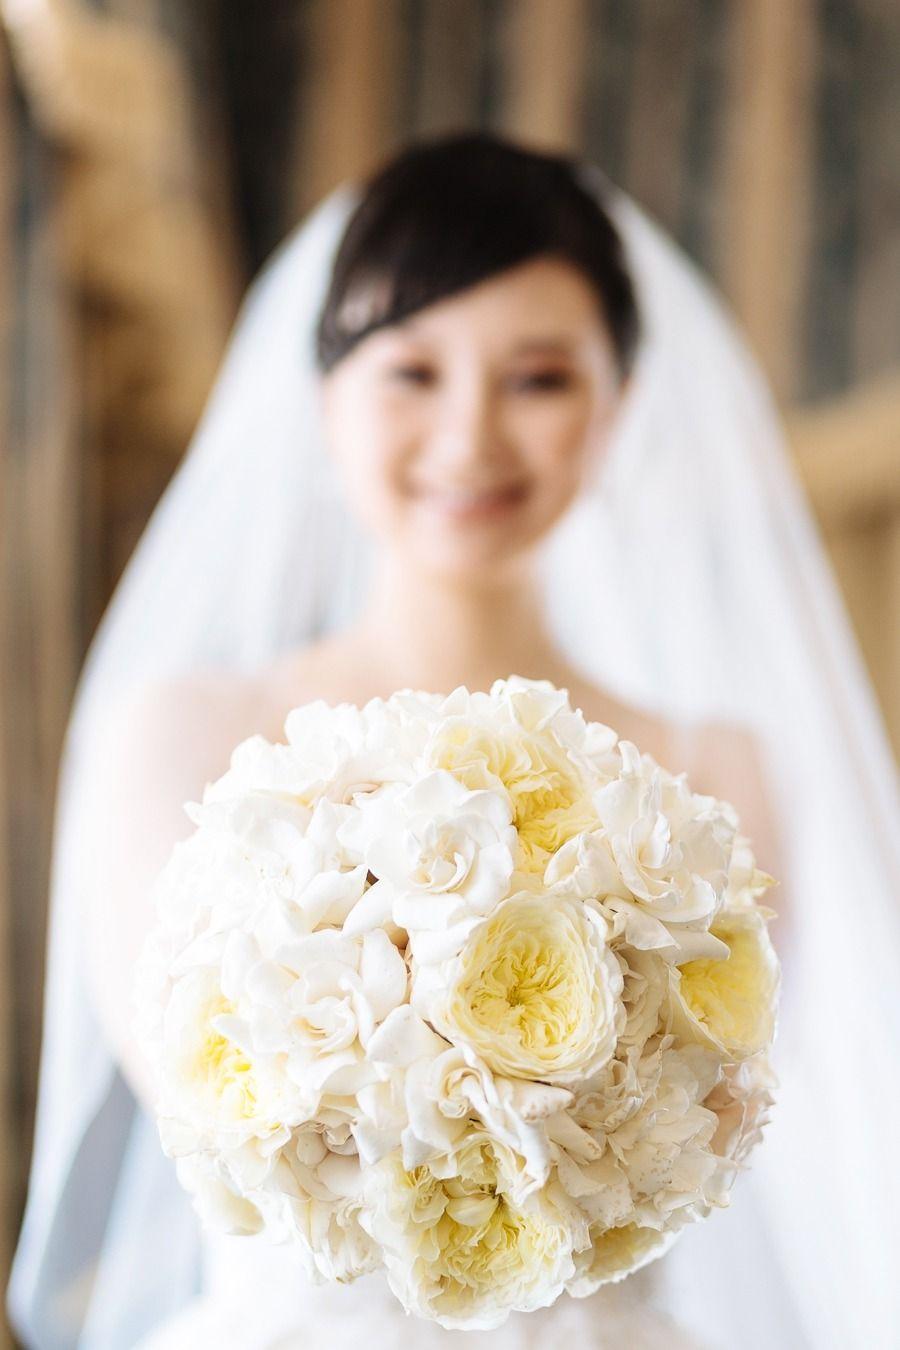 Ivory & Pale Yellow Wedding Bouquet -- Roses & ? Gardenias?? -- See more on SMP here:  http://www.StyleMePretty.com/california-weddings/2014/05/21/elegant-blush-gold-wedding-at-the-fairmont/ Floral Design: VoFloralDesign.com -- Photography: U Me Us Studios - umeusstudios.com